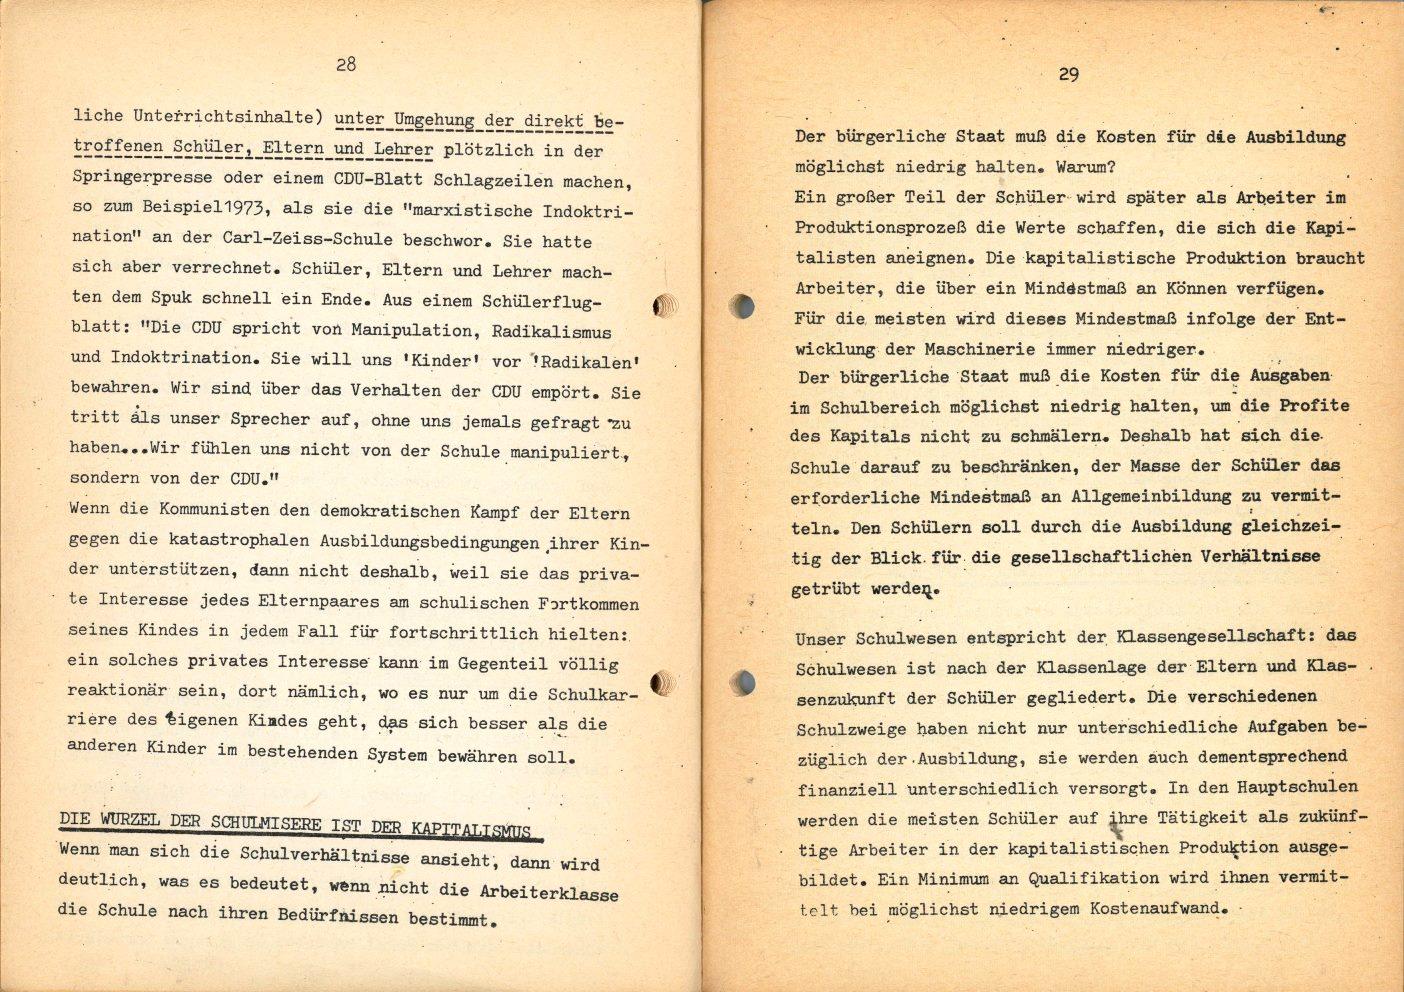 Berlin_SMV_GUV_1974_Schulmisere_17